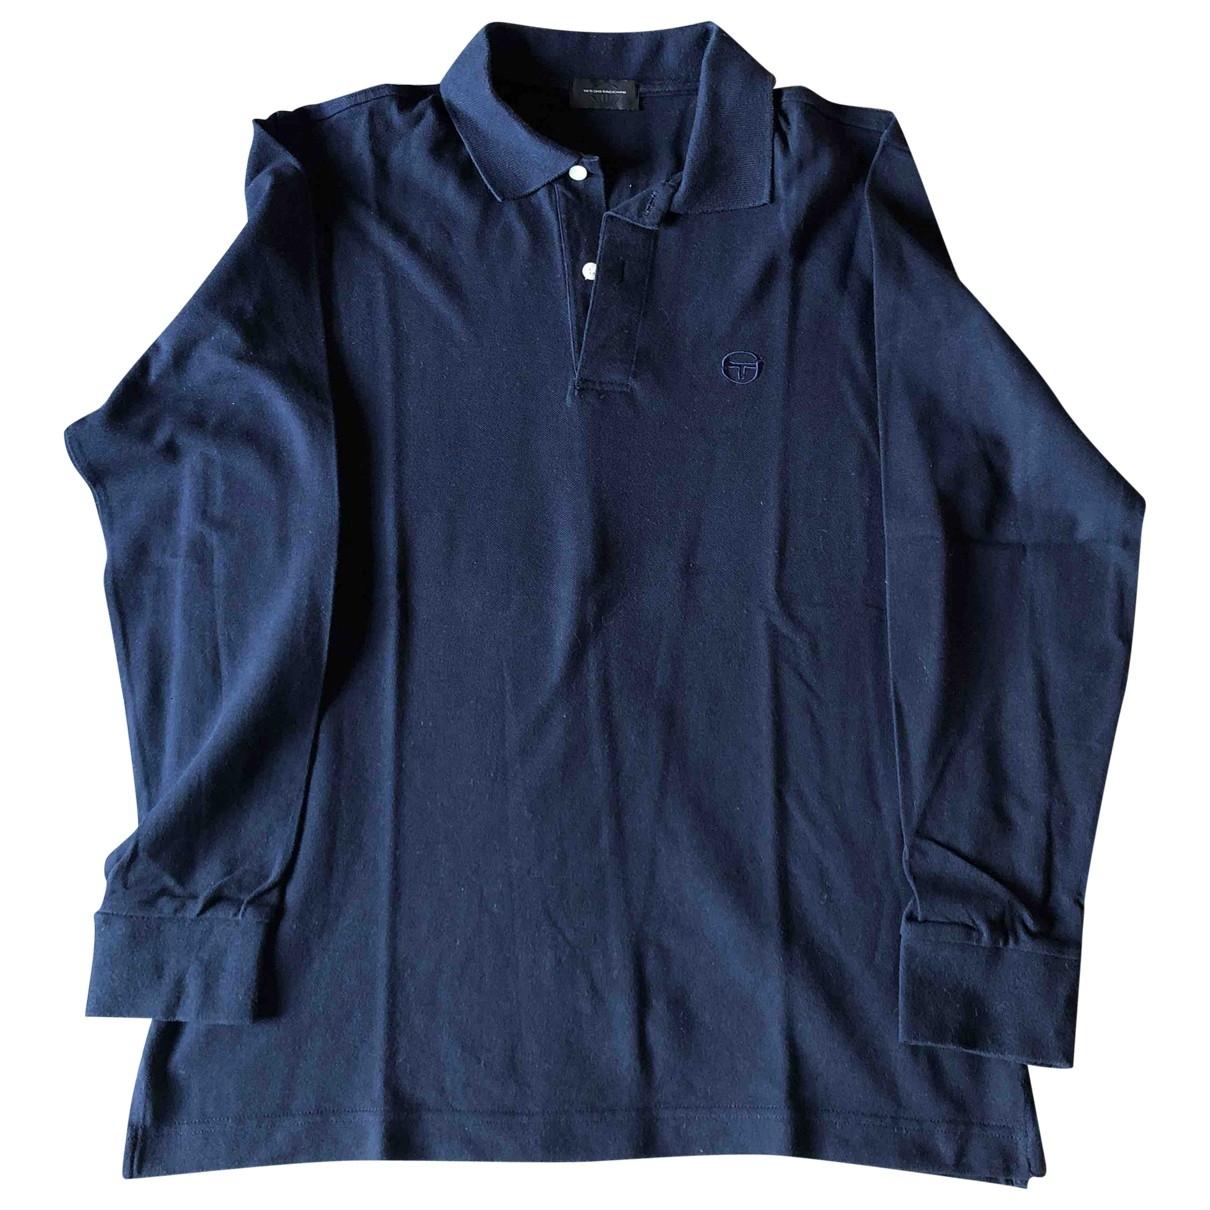 Sergio Tacchini \N Poloshirts in  Blau Baumwolle